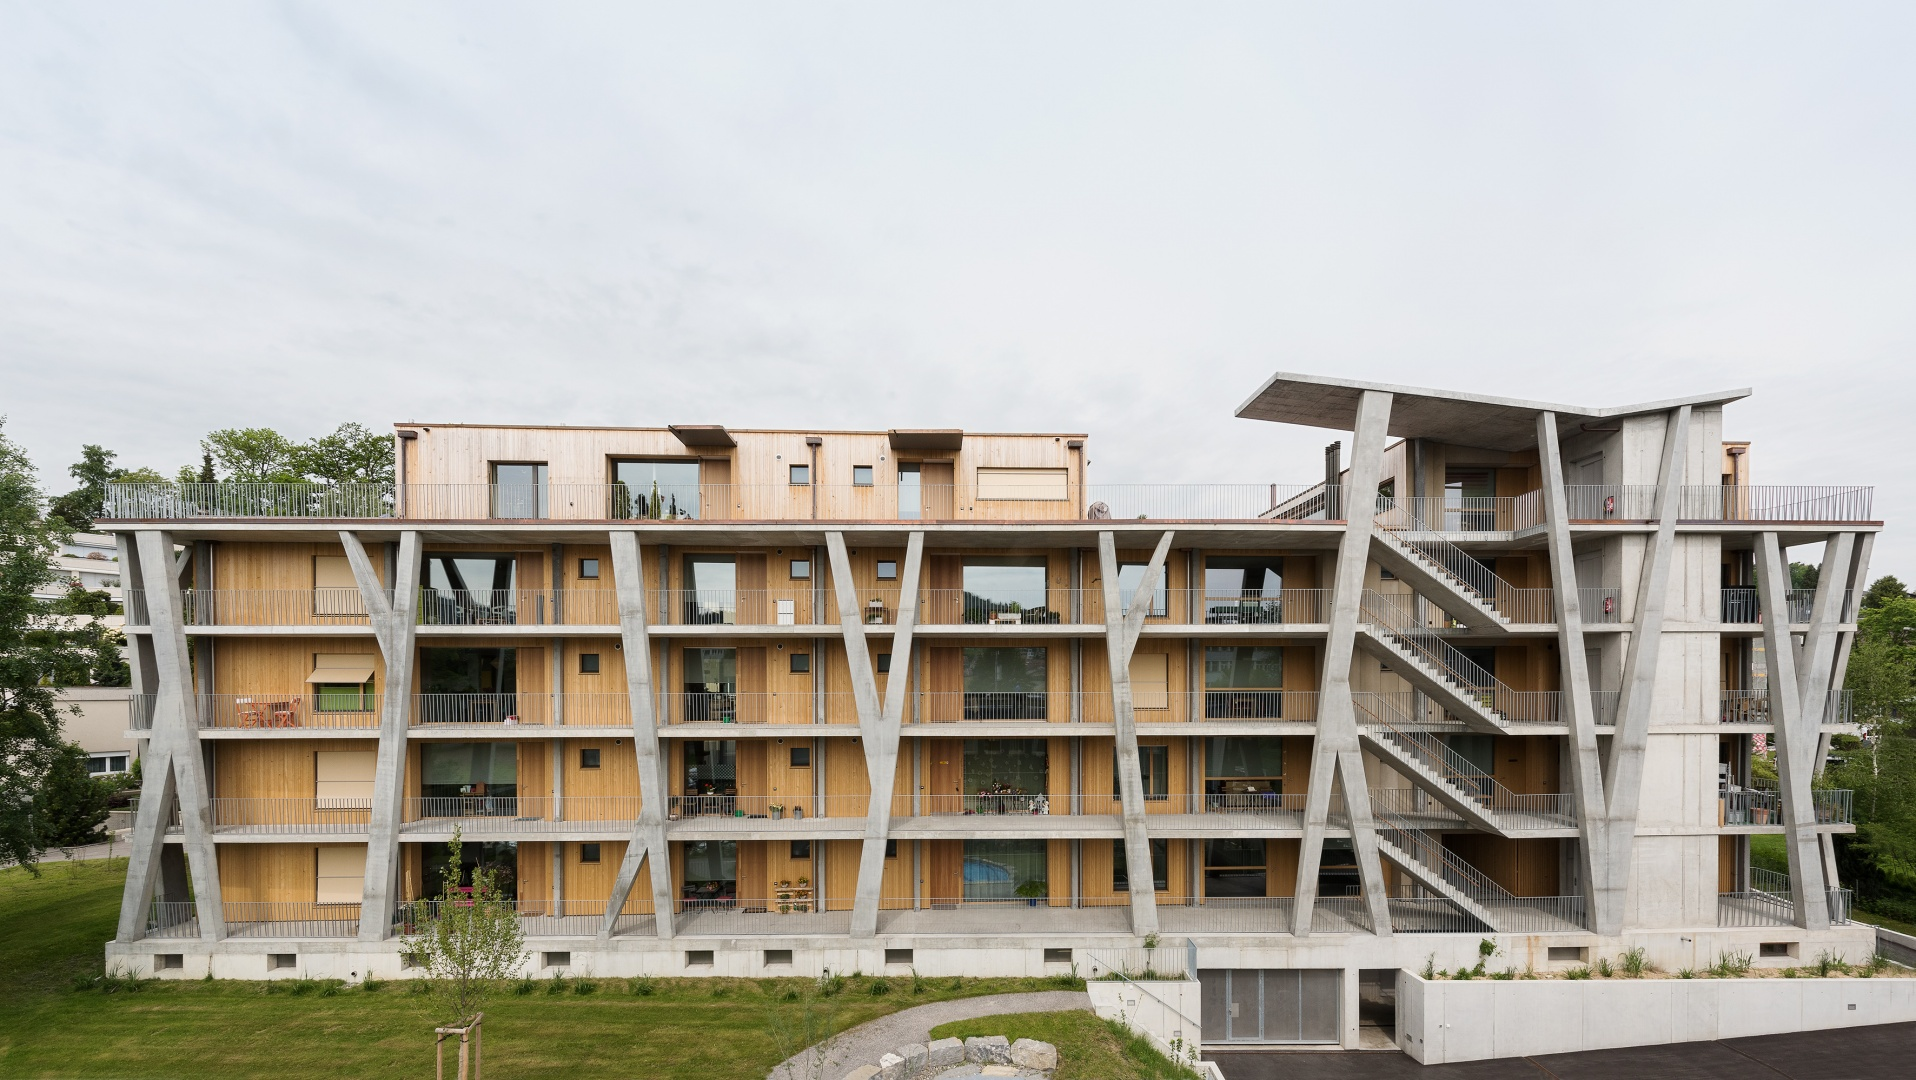 Ostfassade © Christine Blaser, Bildaufbau, Sandrainstrasse 3 3007 Bern